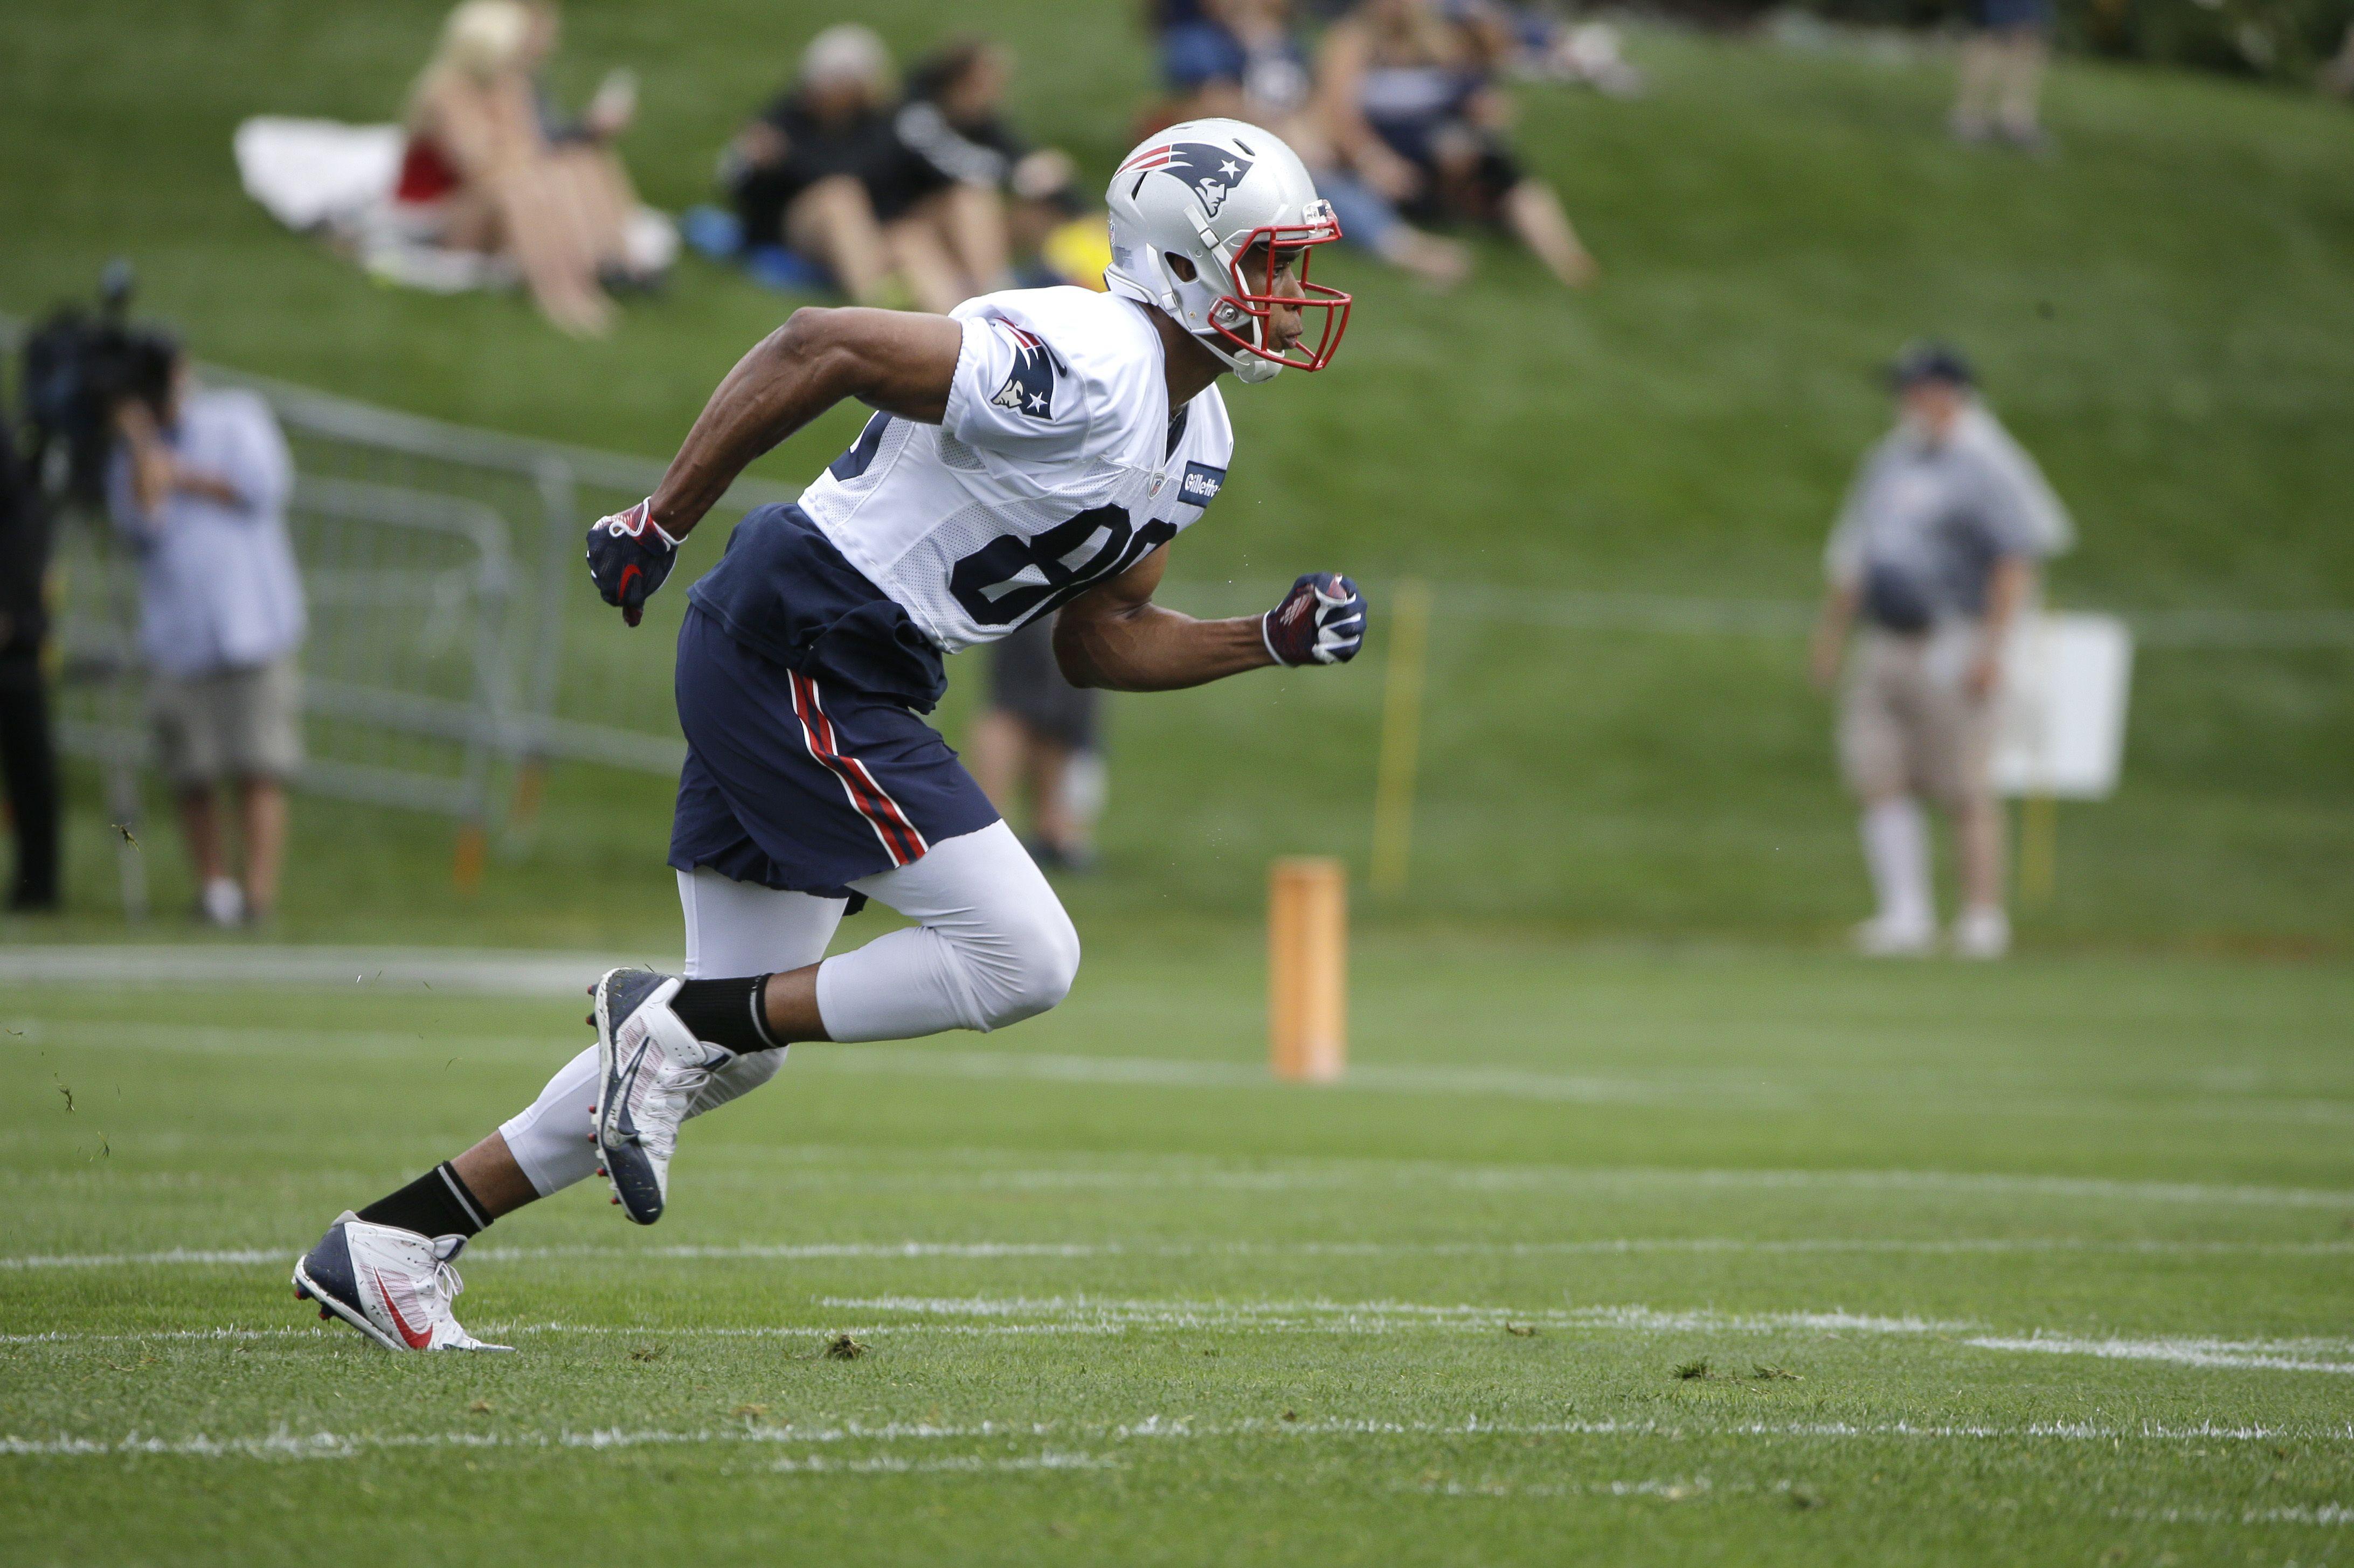 Patriots release wide receiver Jordan Matthews - The Boston Globe